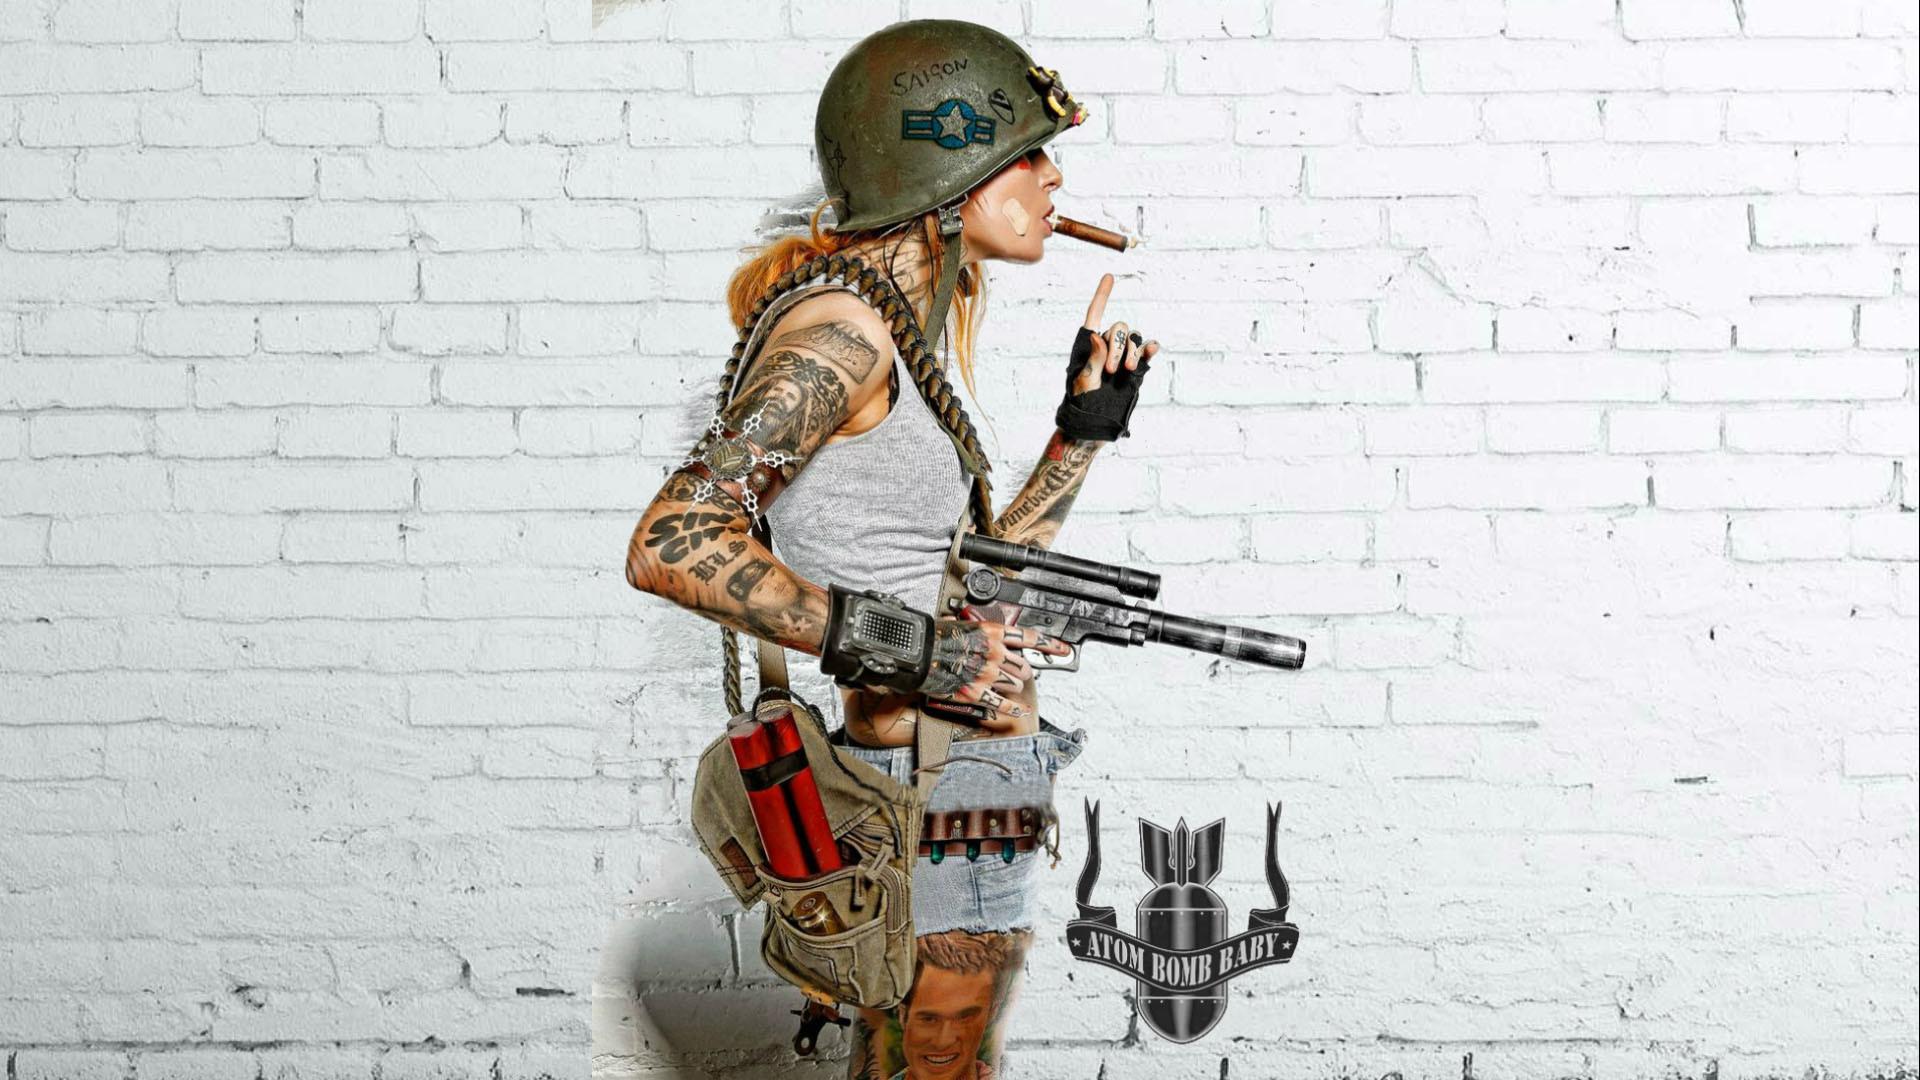 Atom-Bomb-Baby-Fallout-4-Game-Girl-Wallpaper-